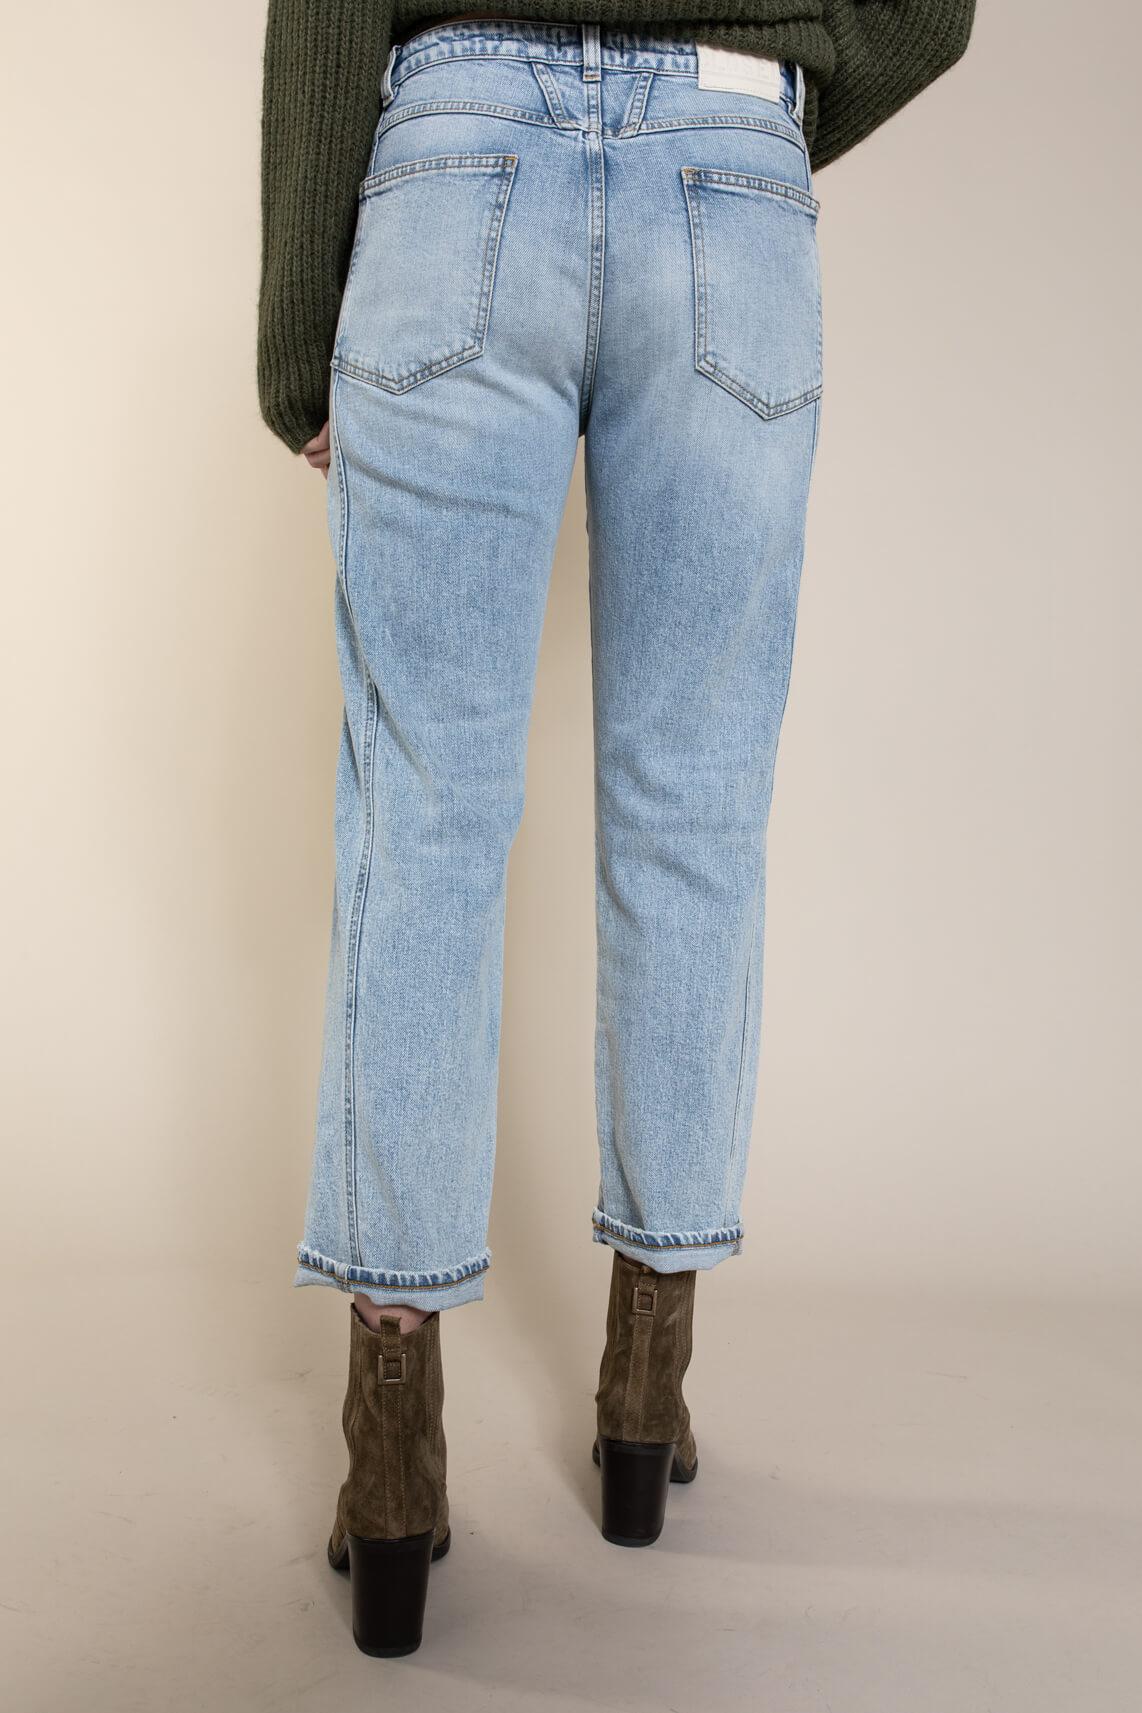 Closed Dames Jeans slim fit mid waist Blauw